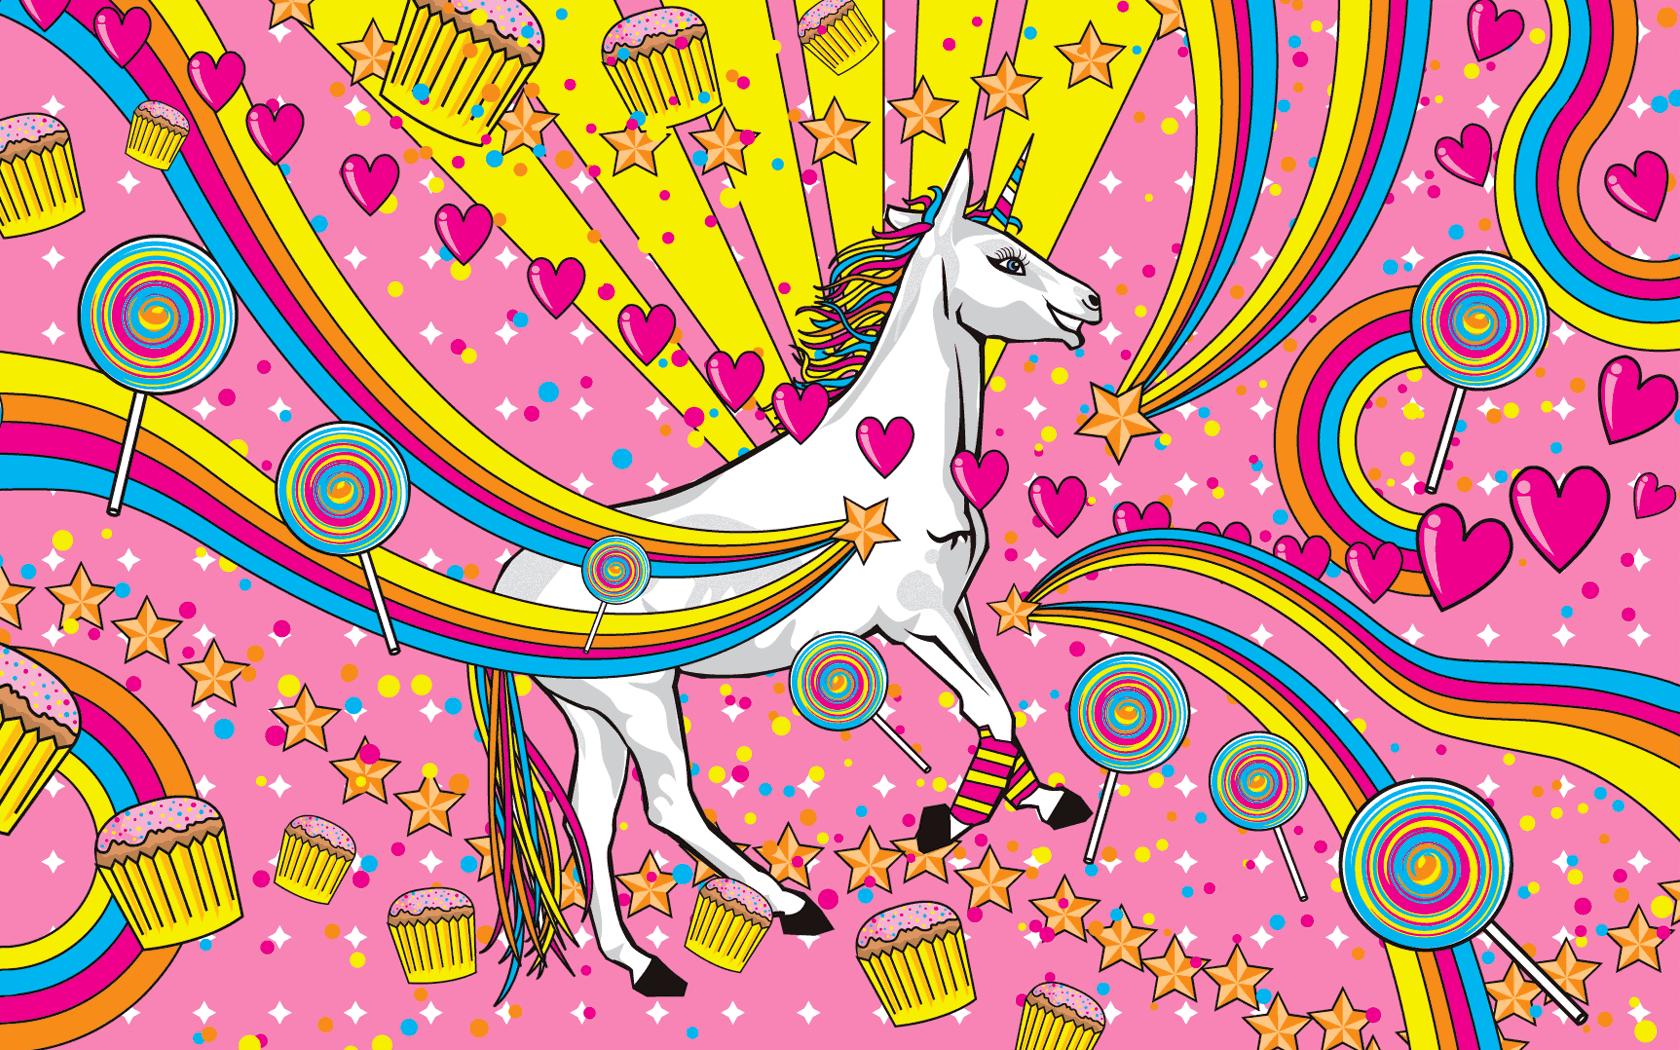 Pink Unicorn Wallpaper - WallpaperSafari